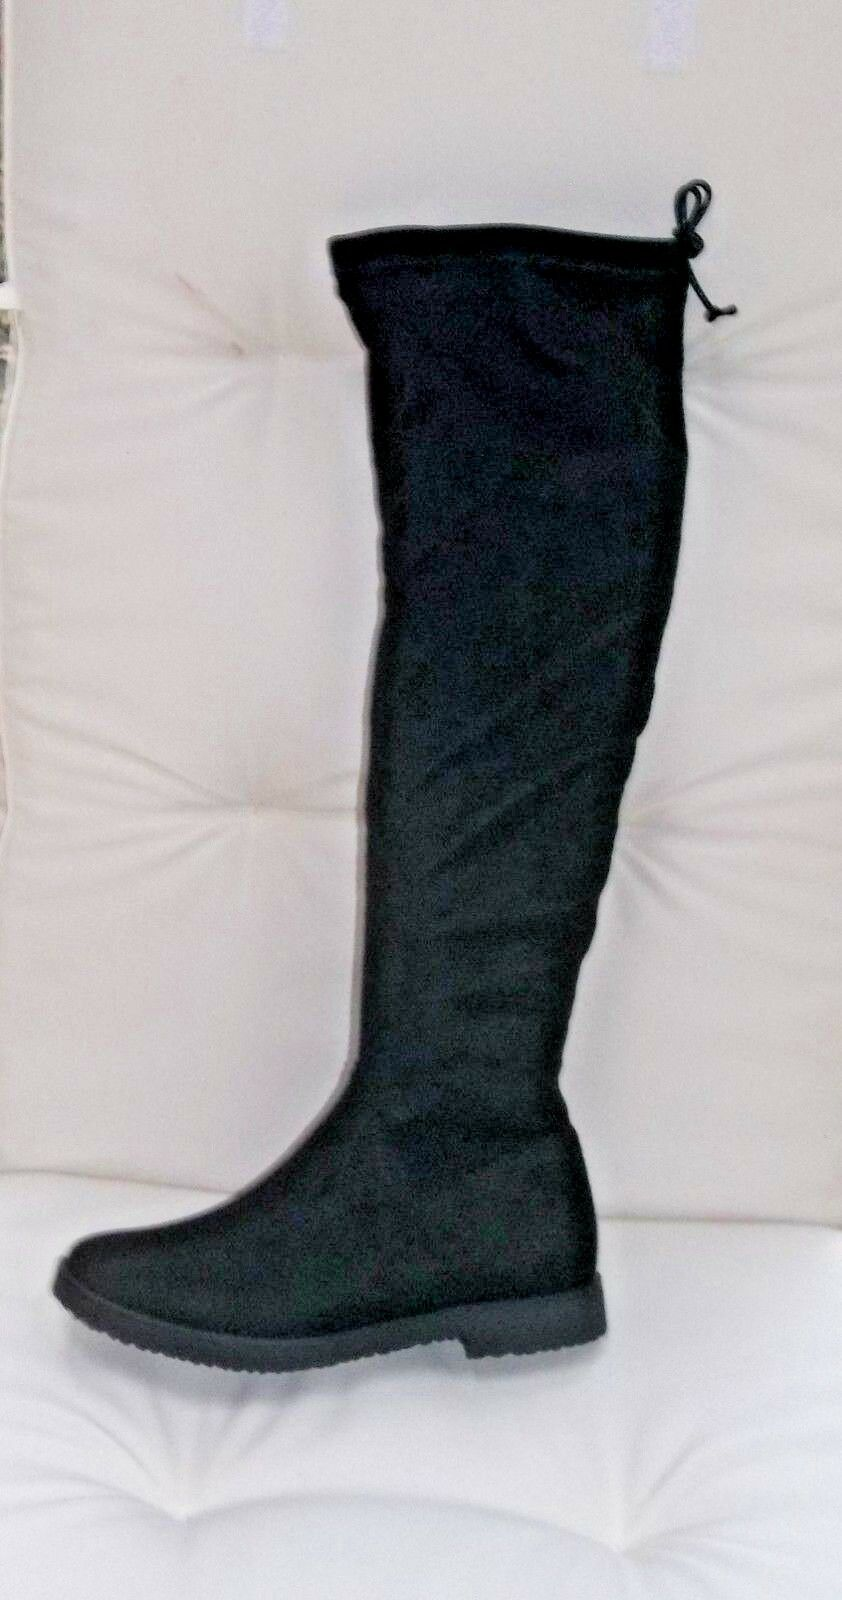 Marco Tozzi noir textile long bottes, UK 7  EU 40,    BNWB